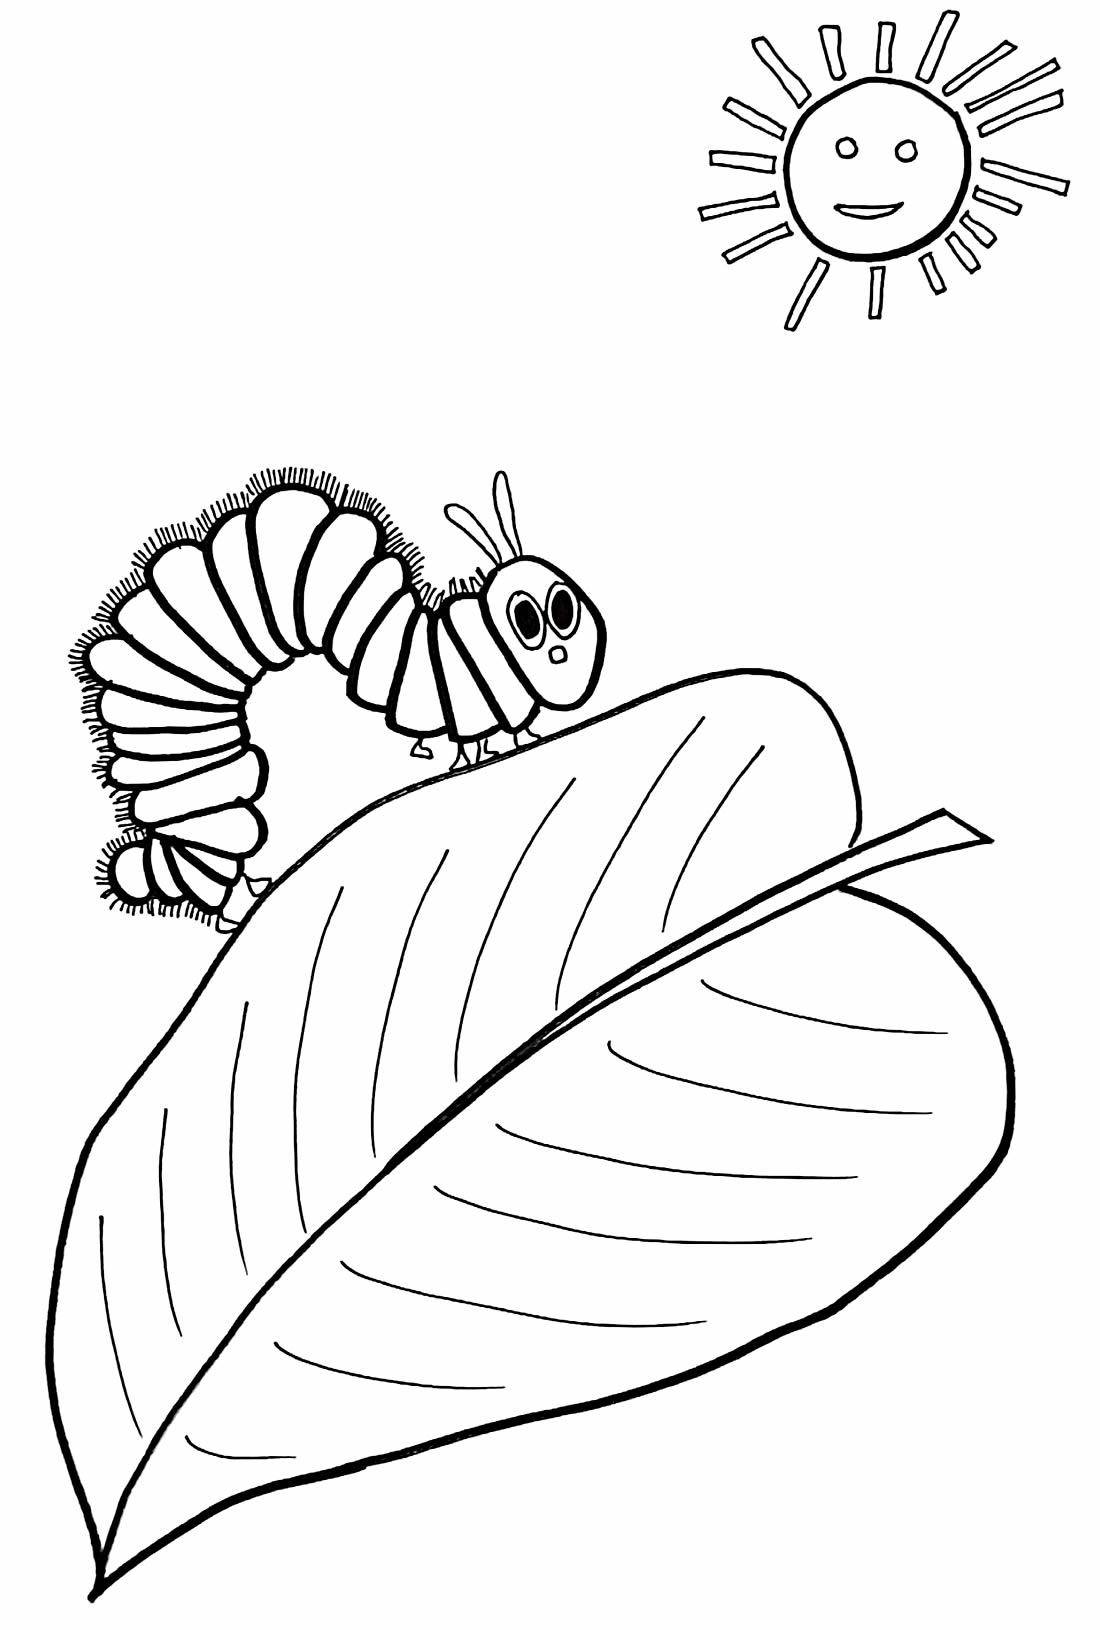 Desenho para pintar de Lagarta